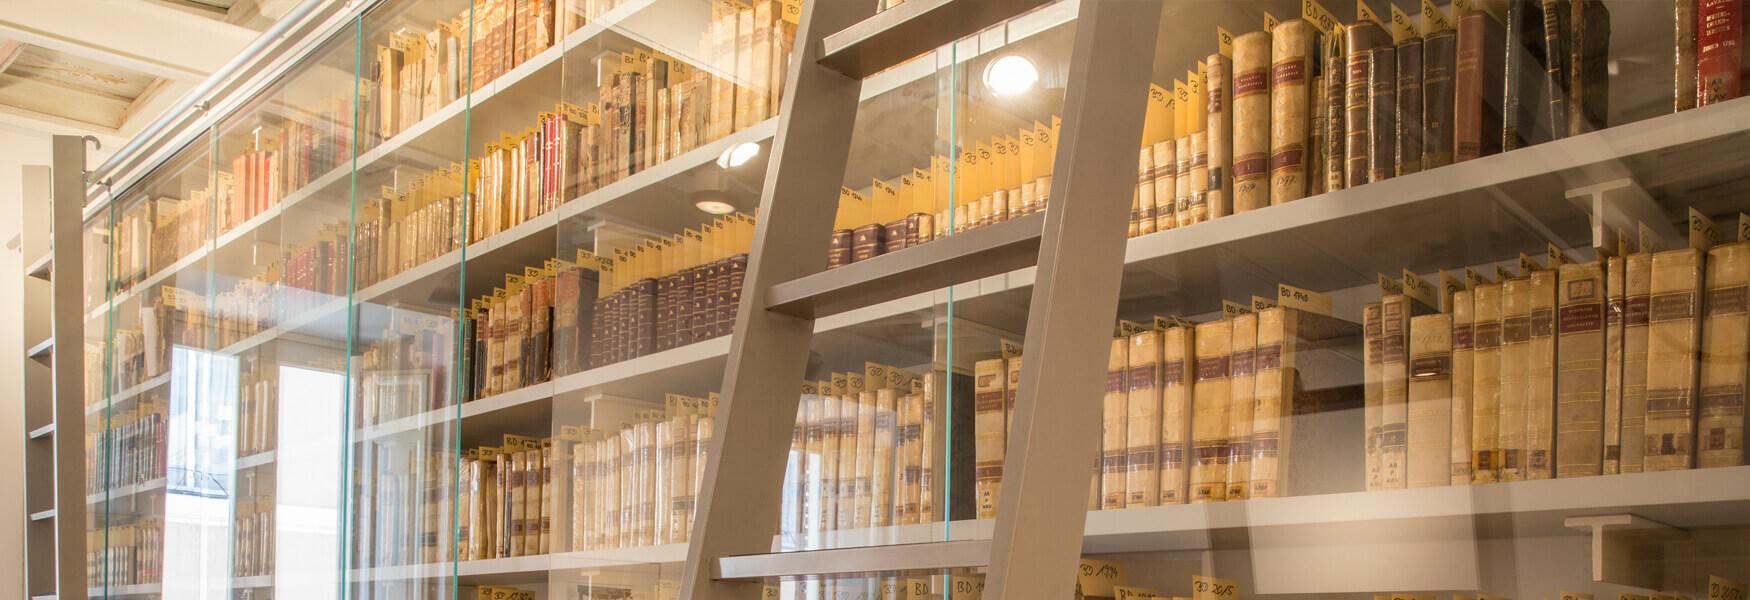 Historische Bibliothek